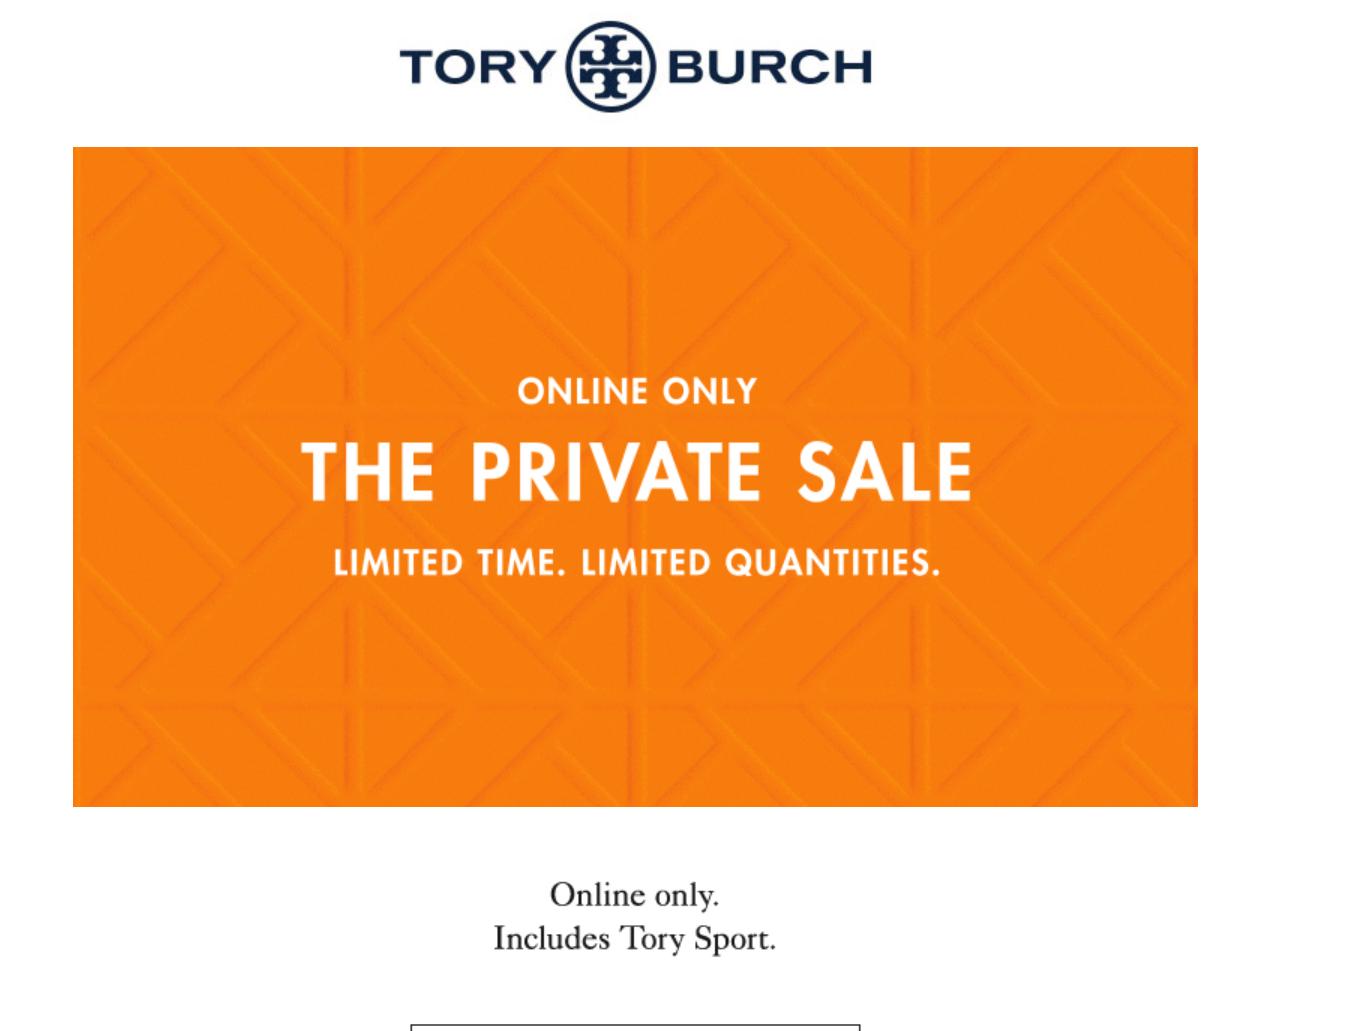 88b41db25c881 Tory Burch Private Sale - Slickdeals.net